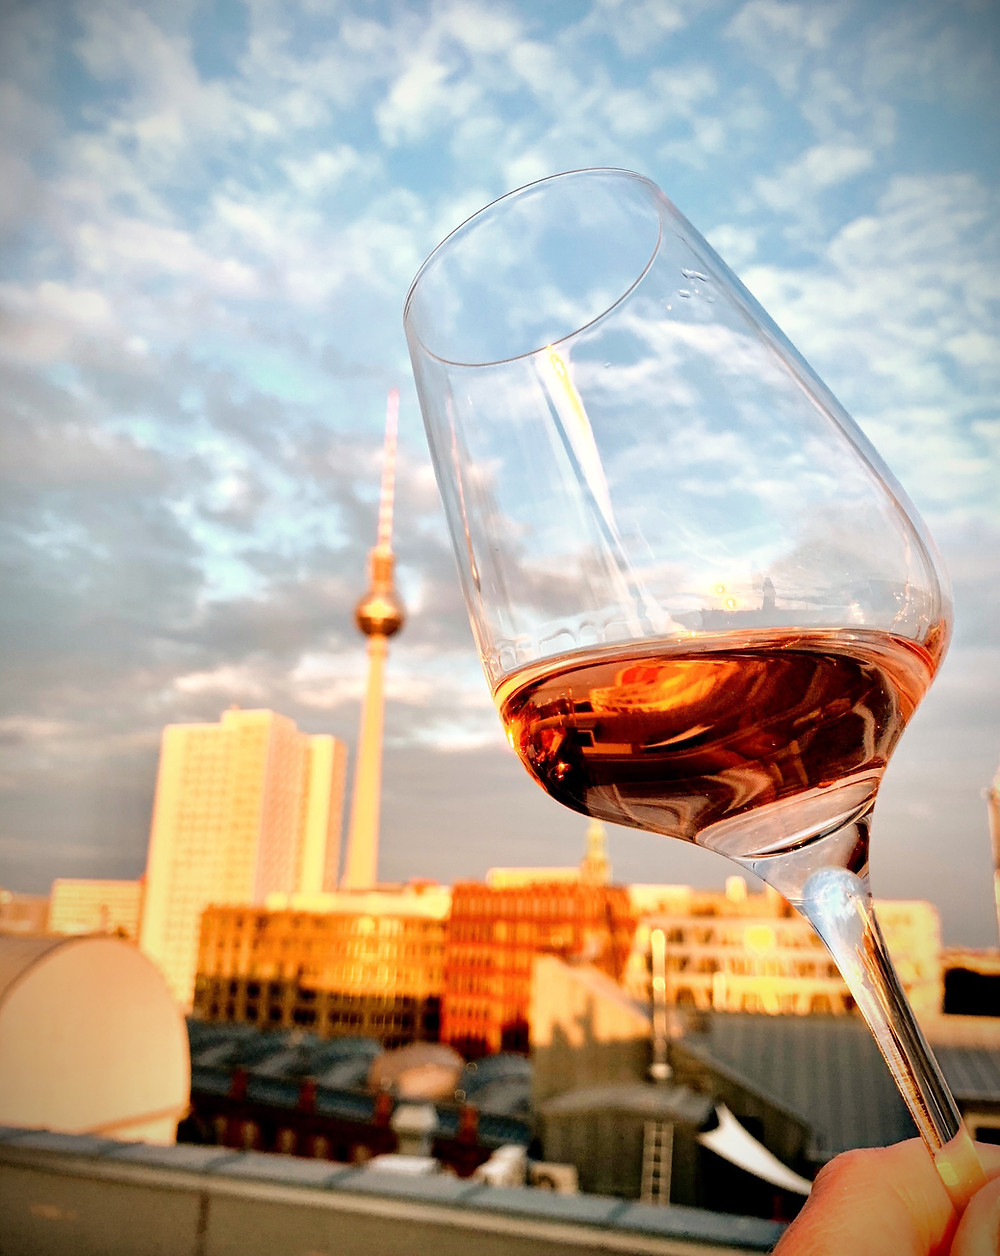 Independent Escort Berlin Dinner Date